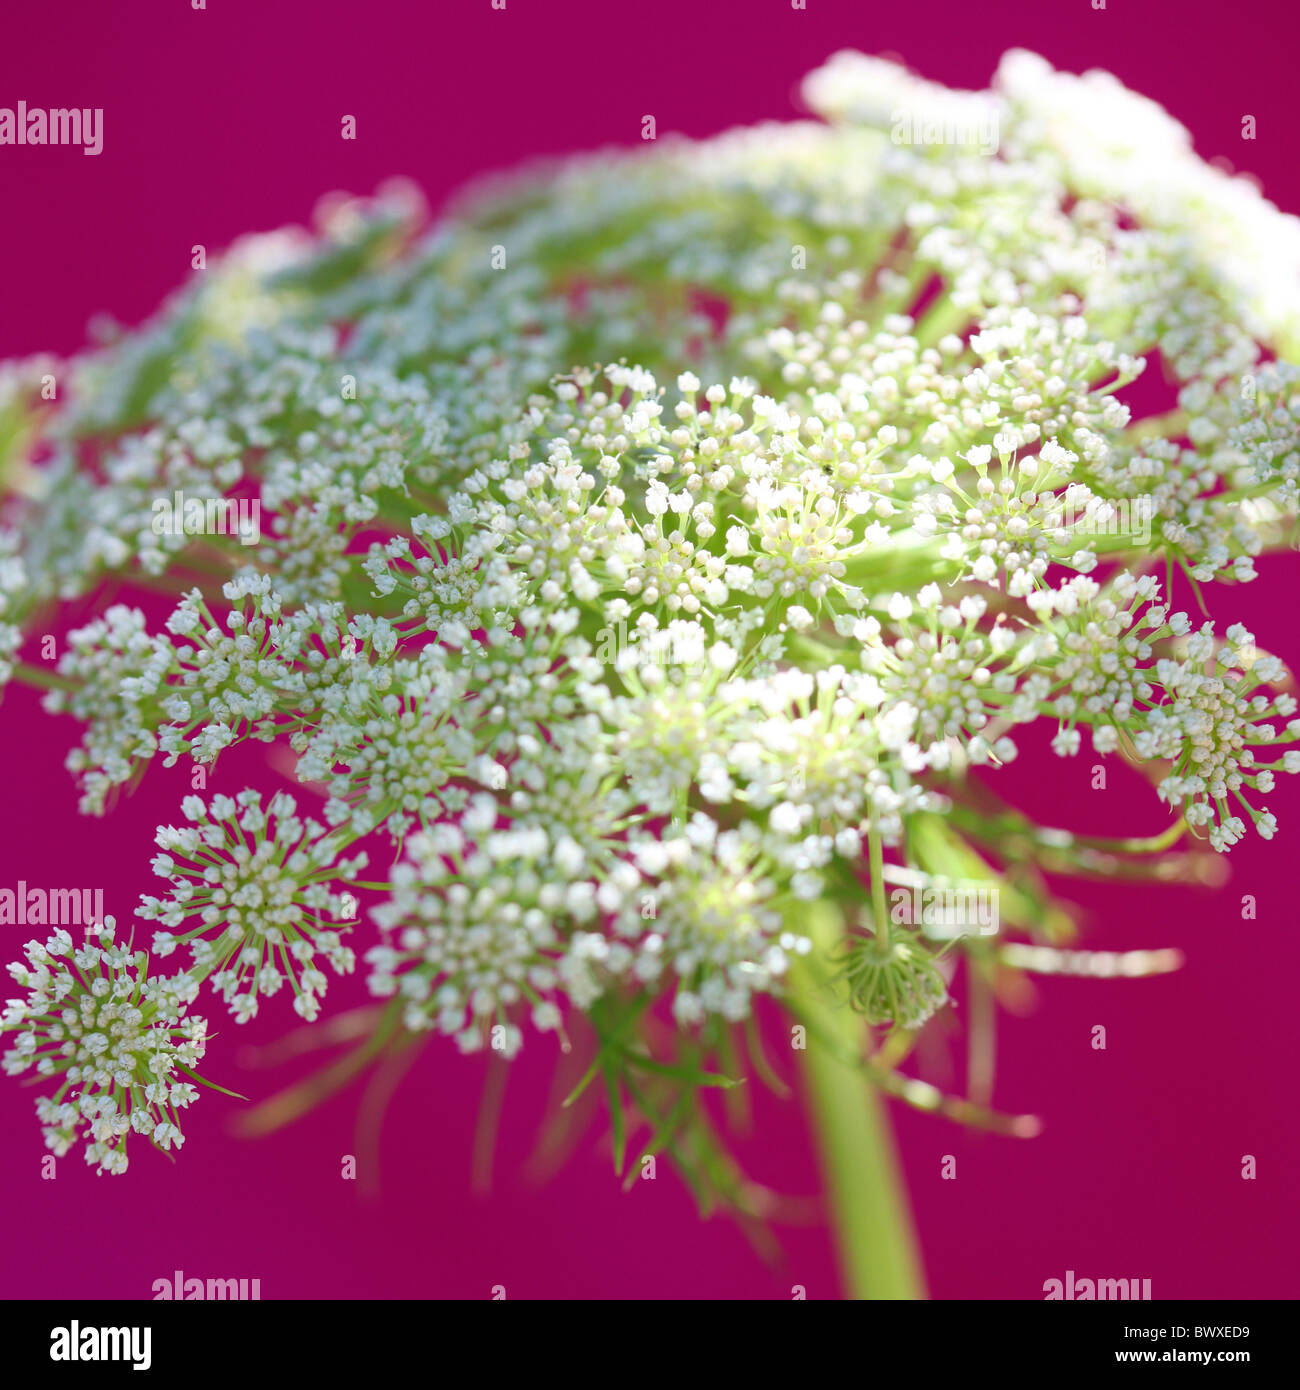 gorgeous ammi on cerise Jane-Ann Butler Photography JABP892 - Stock Image